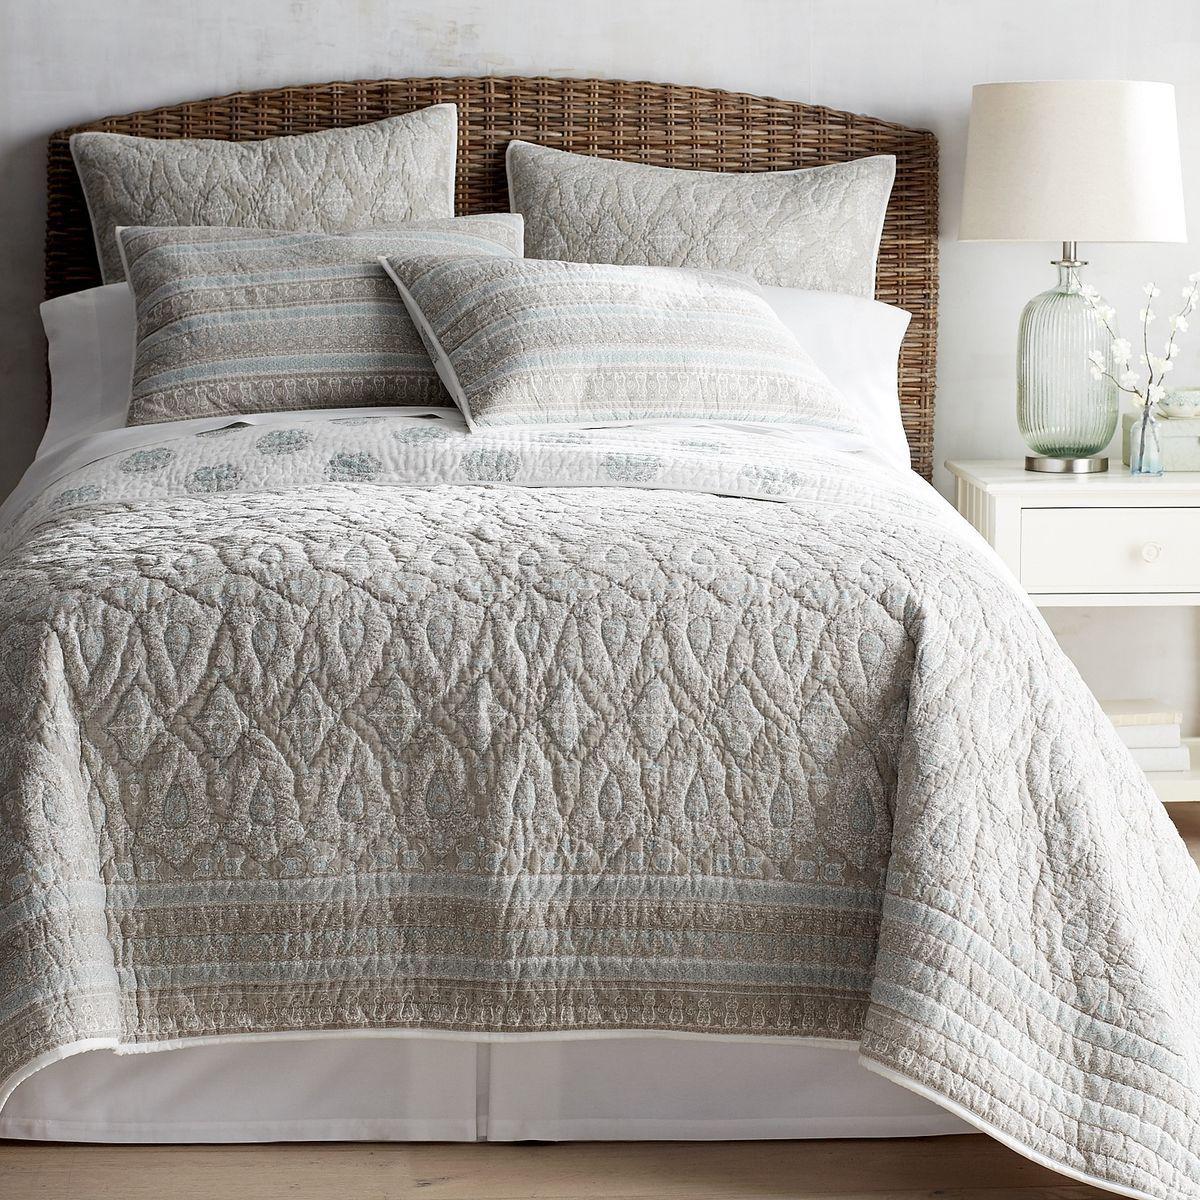 Sham Meaning In Bedding - Bedding Design Ideas